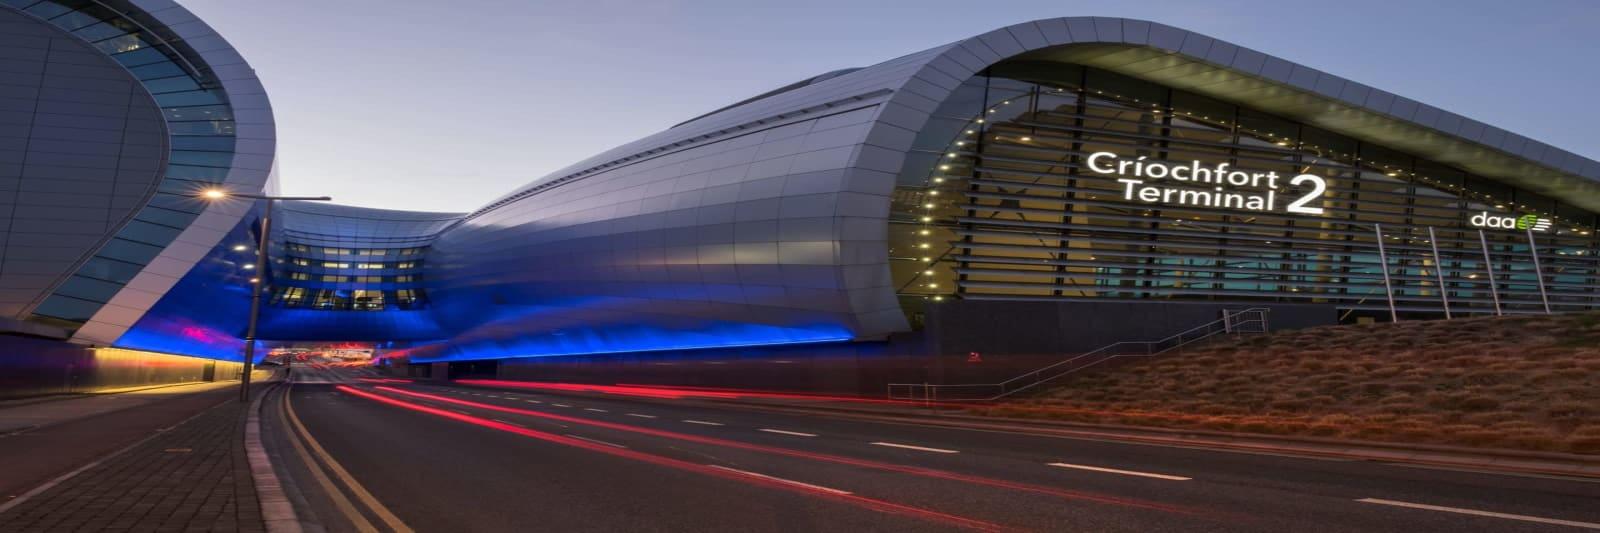 Dublin-Airport-use.jpg